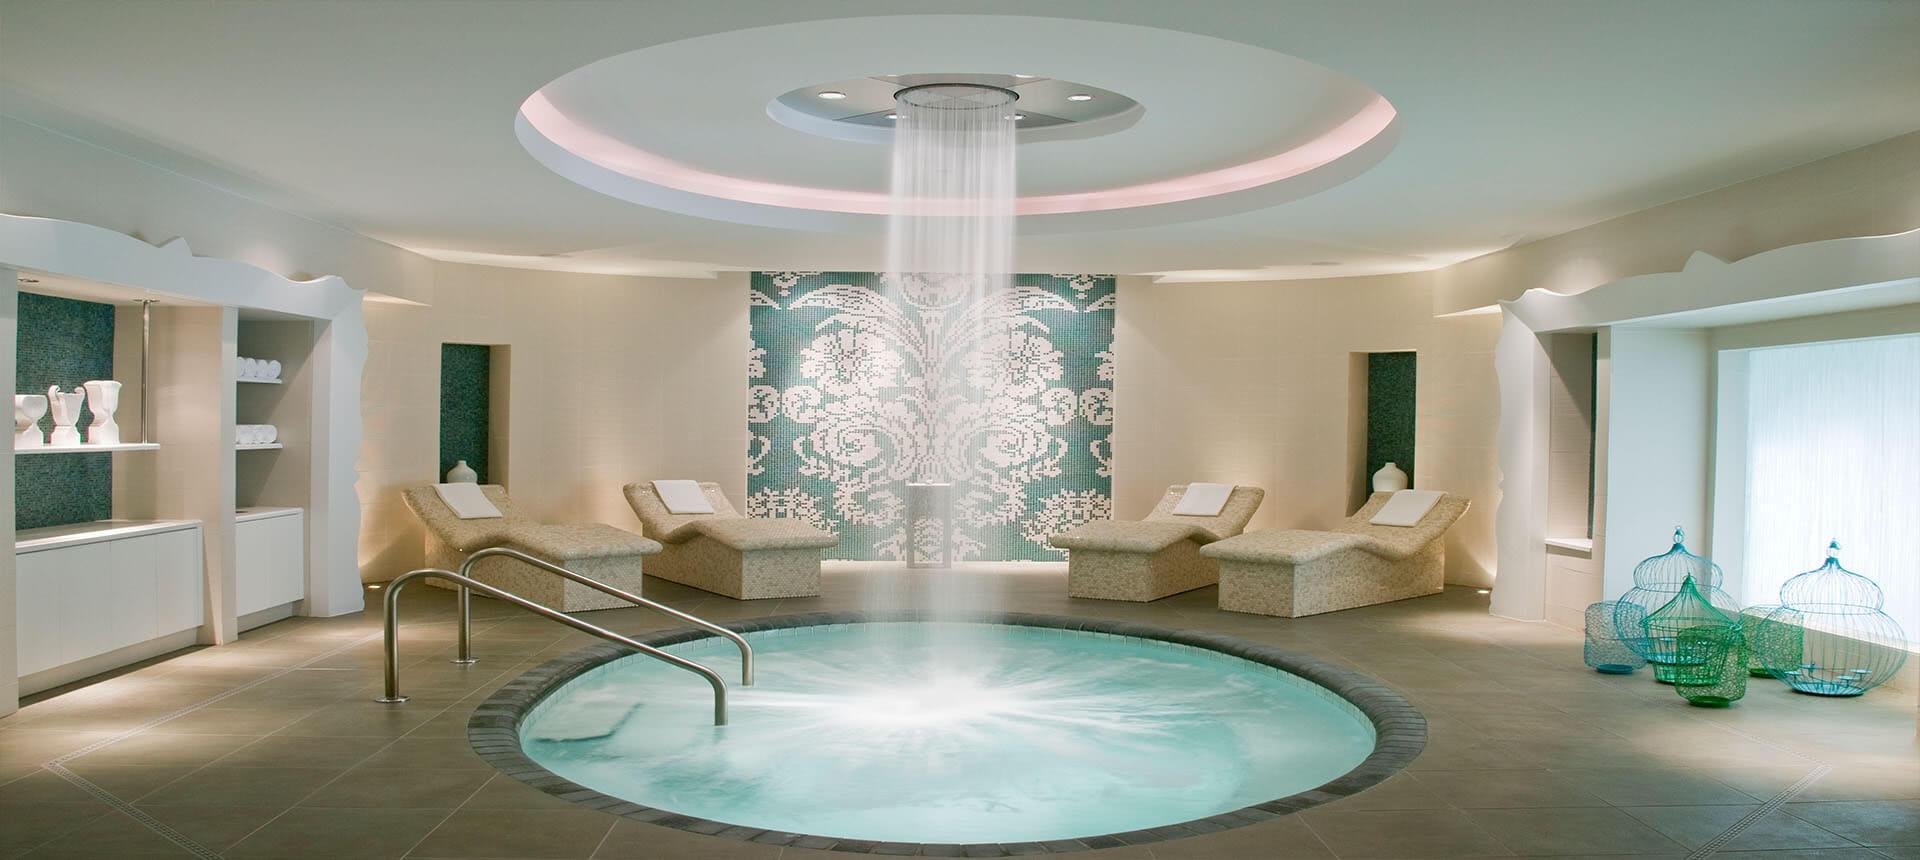 eau palm beach resort spa callisonrtkl. Black Bedroom Furniture Sets. Home Design Ideas